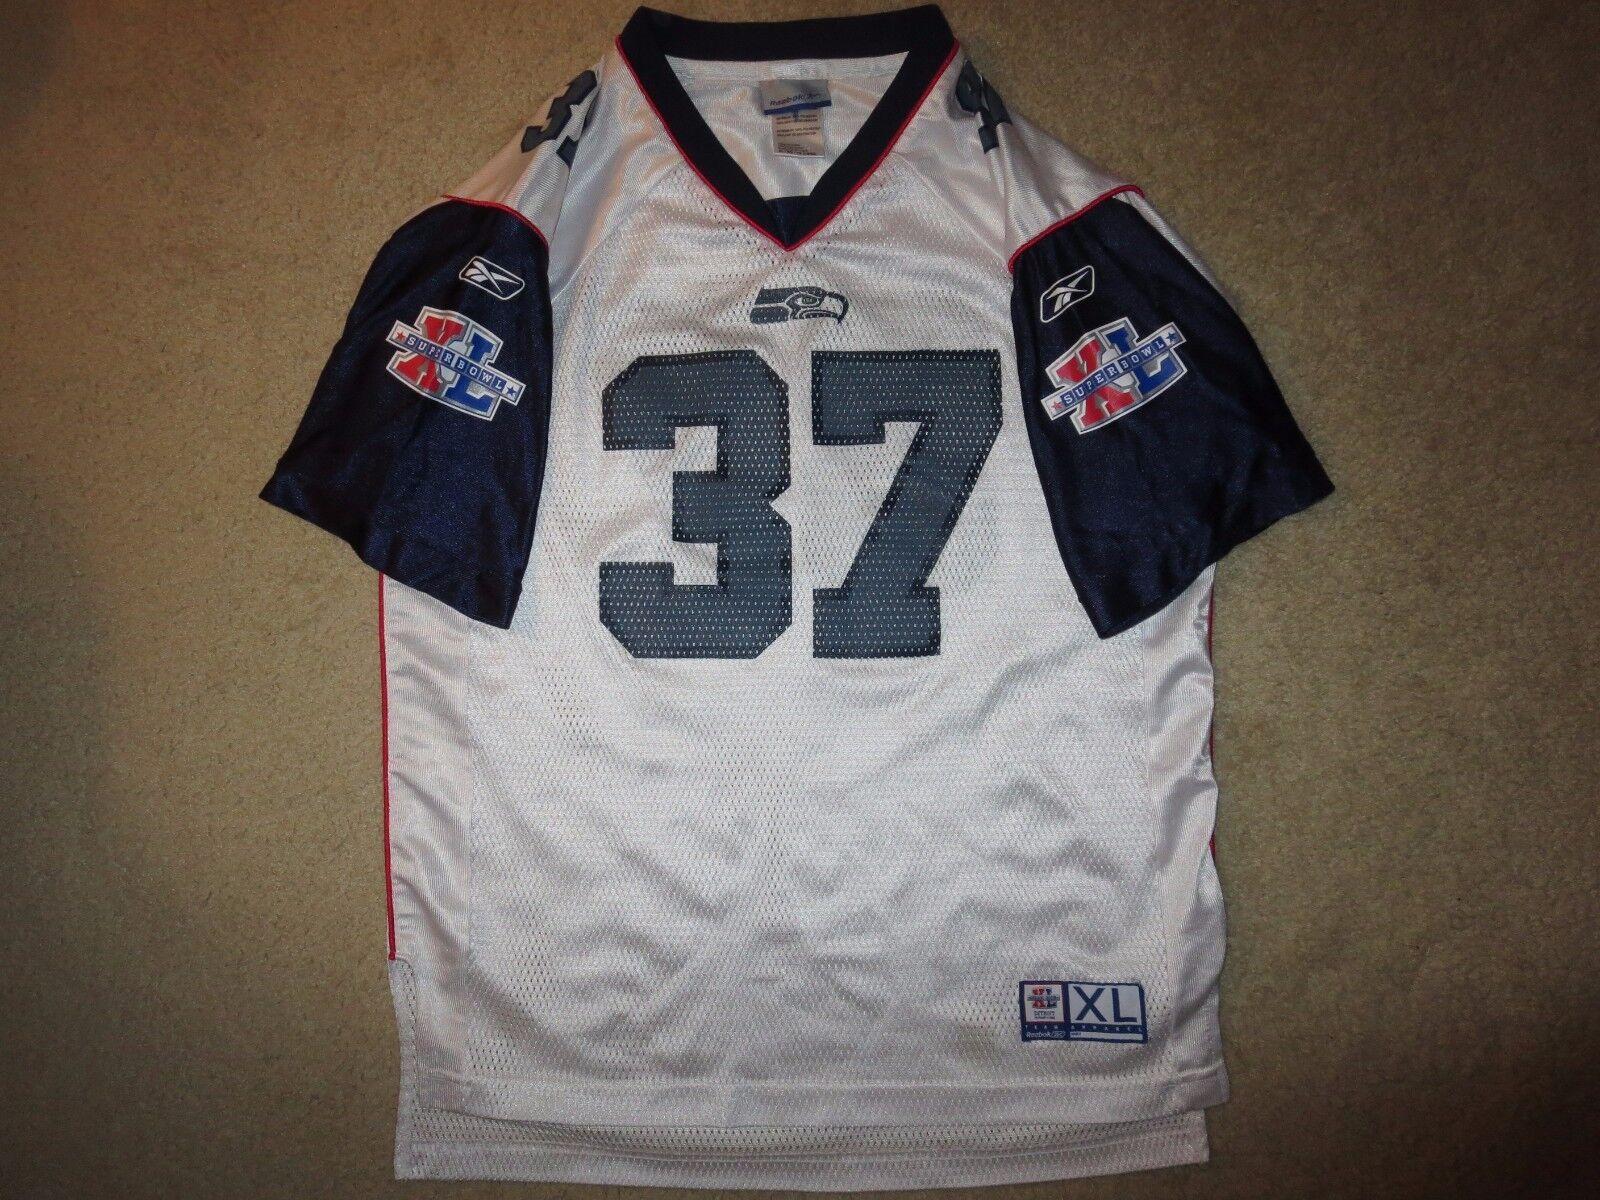 official photos 3f343 d1674 Bowl Super Seahawks 37 Alexander Shaun NFL Seattle Design ...